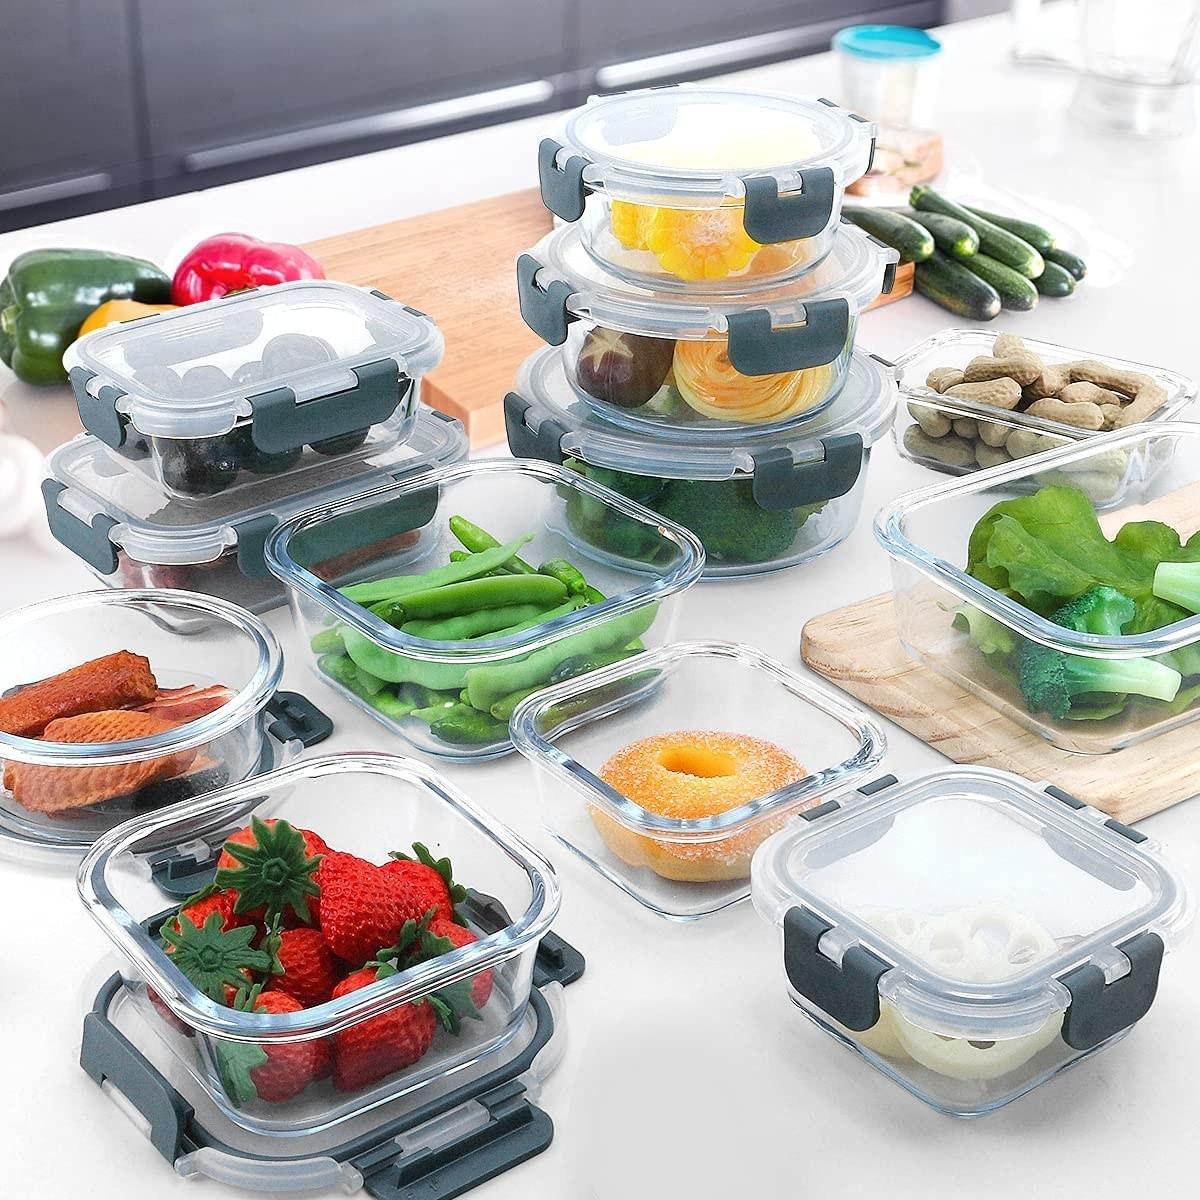 the 24 piece glass food storage set in gray